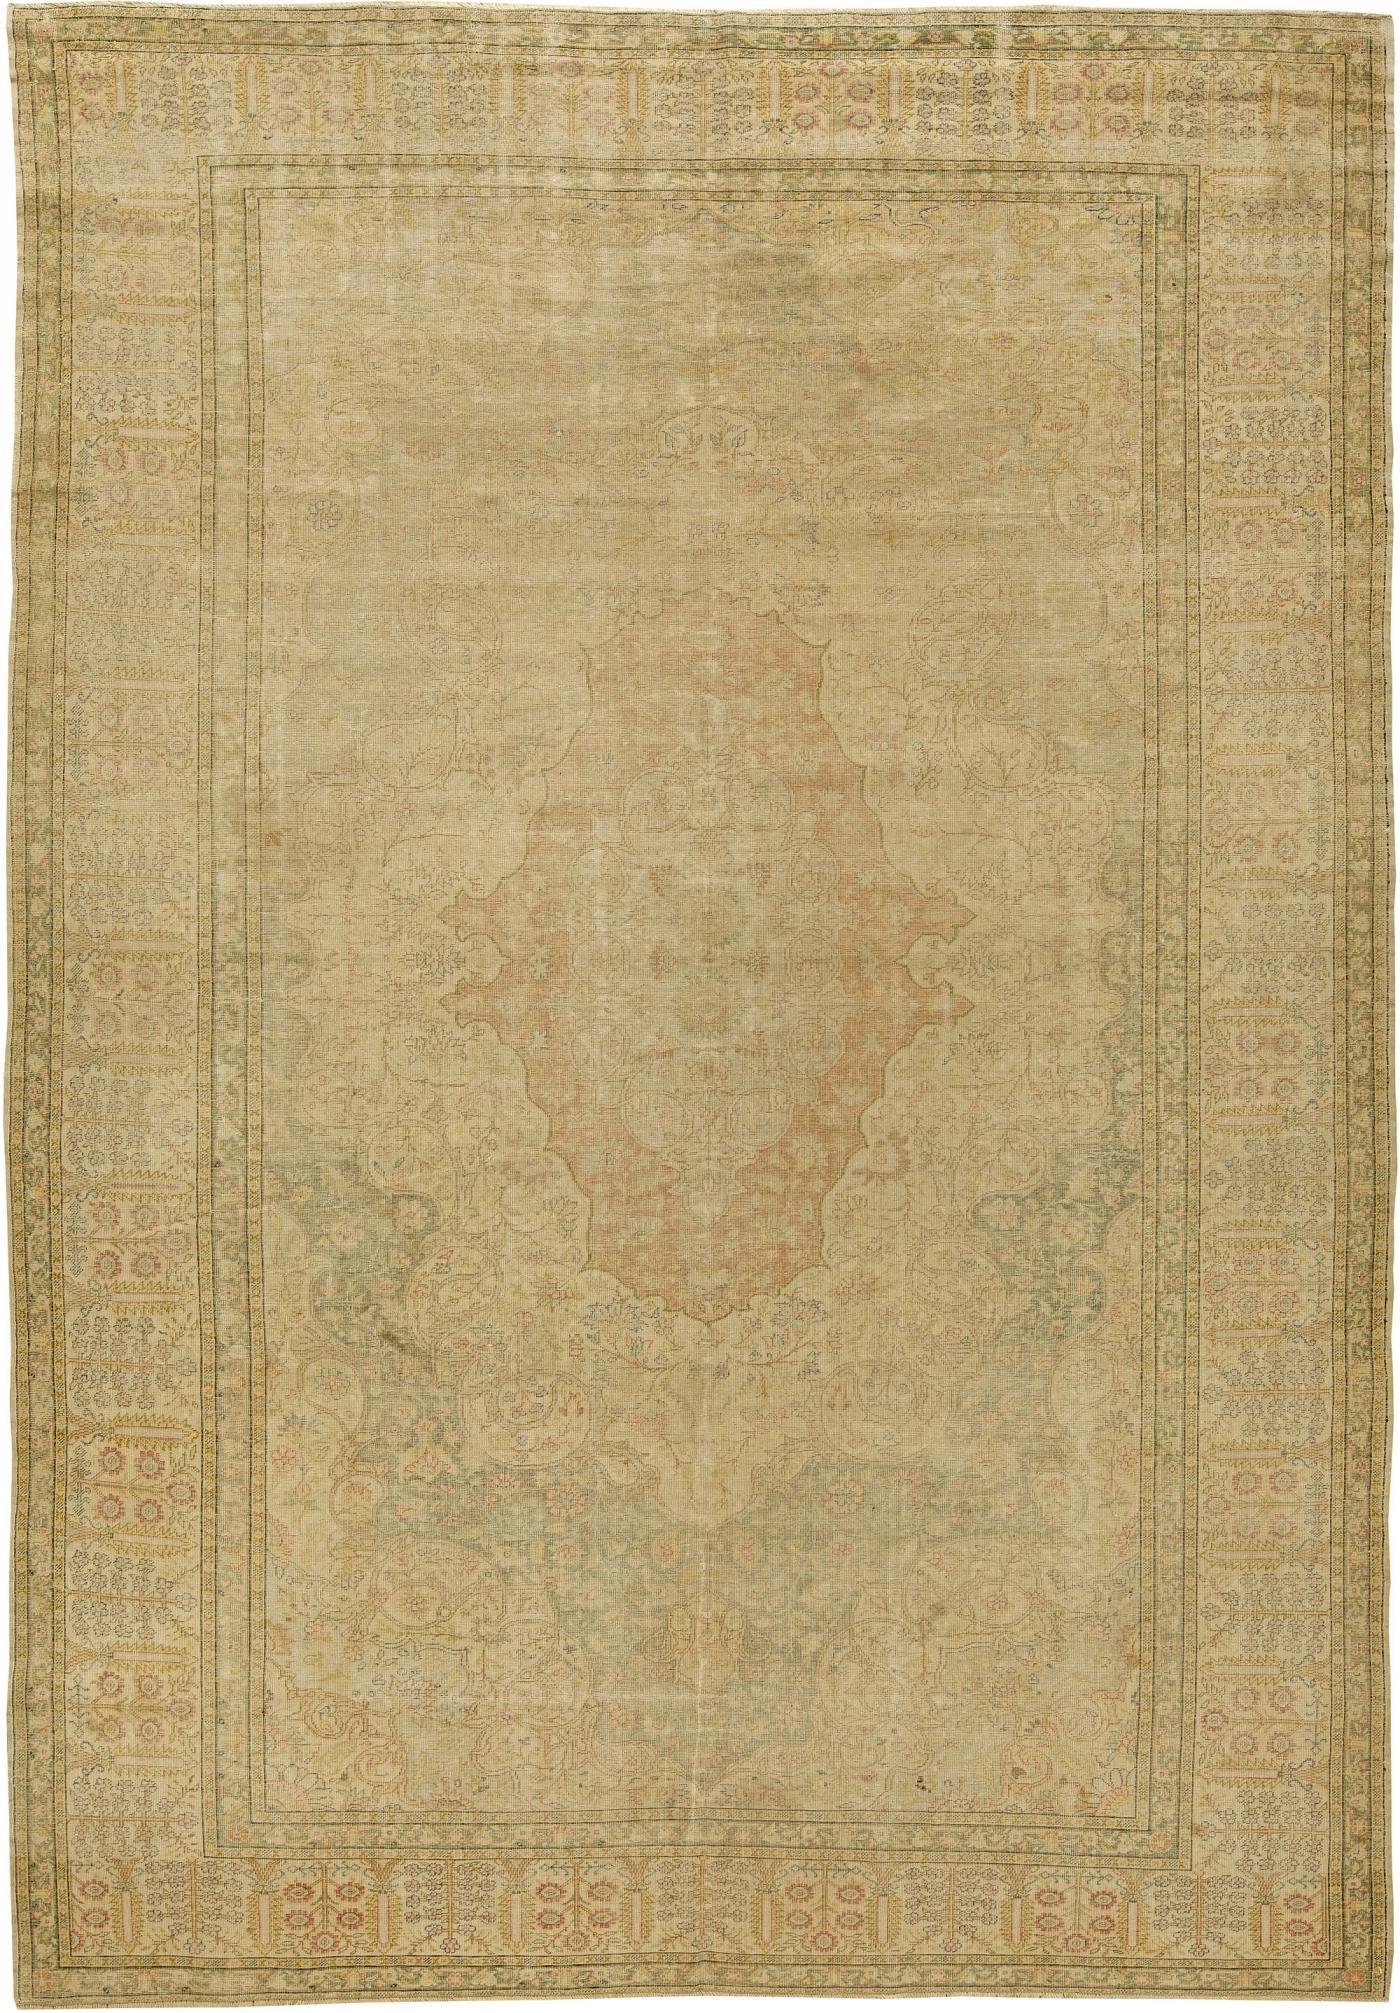 Listings / Decorative Arts / Rugs & Textiles / Rugs & Carpets · Antique Turkish Silk Rug